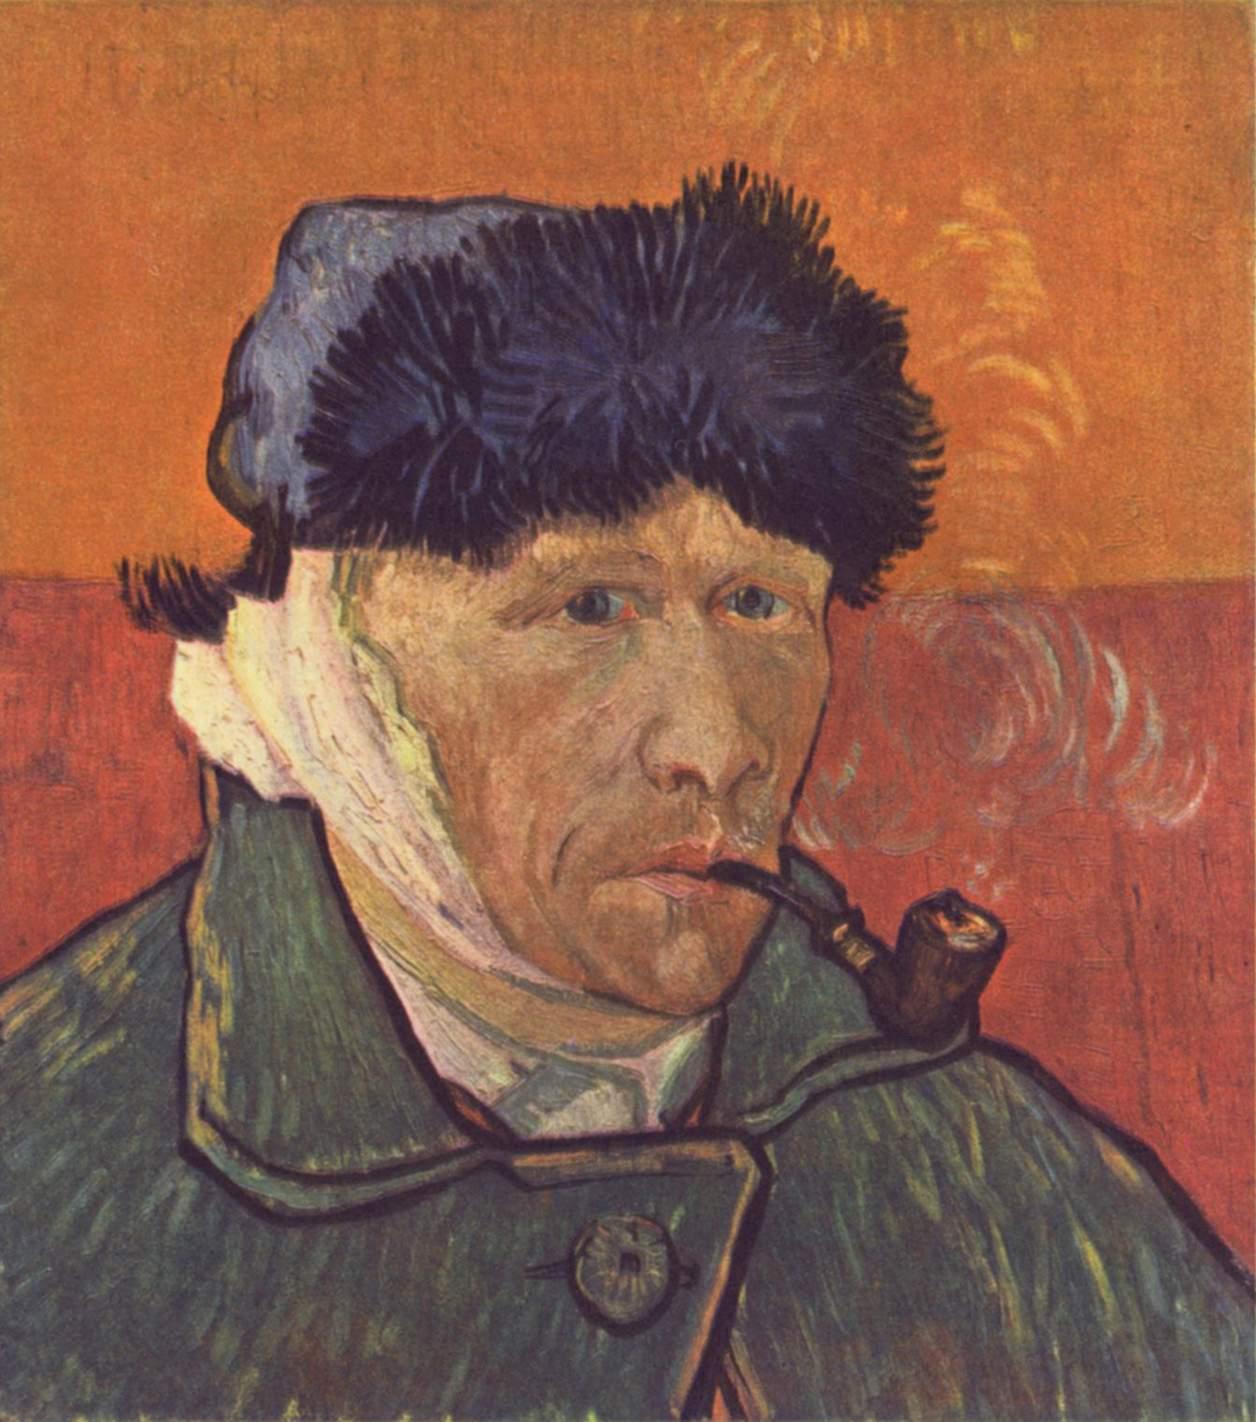 Artist Vincent Van Gogh 39 Did Not Shoot Himself 39 But Was